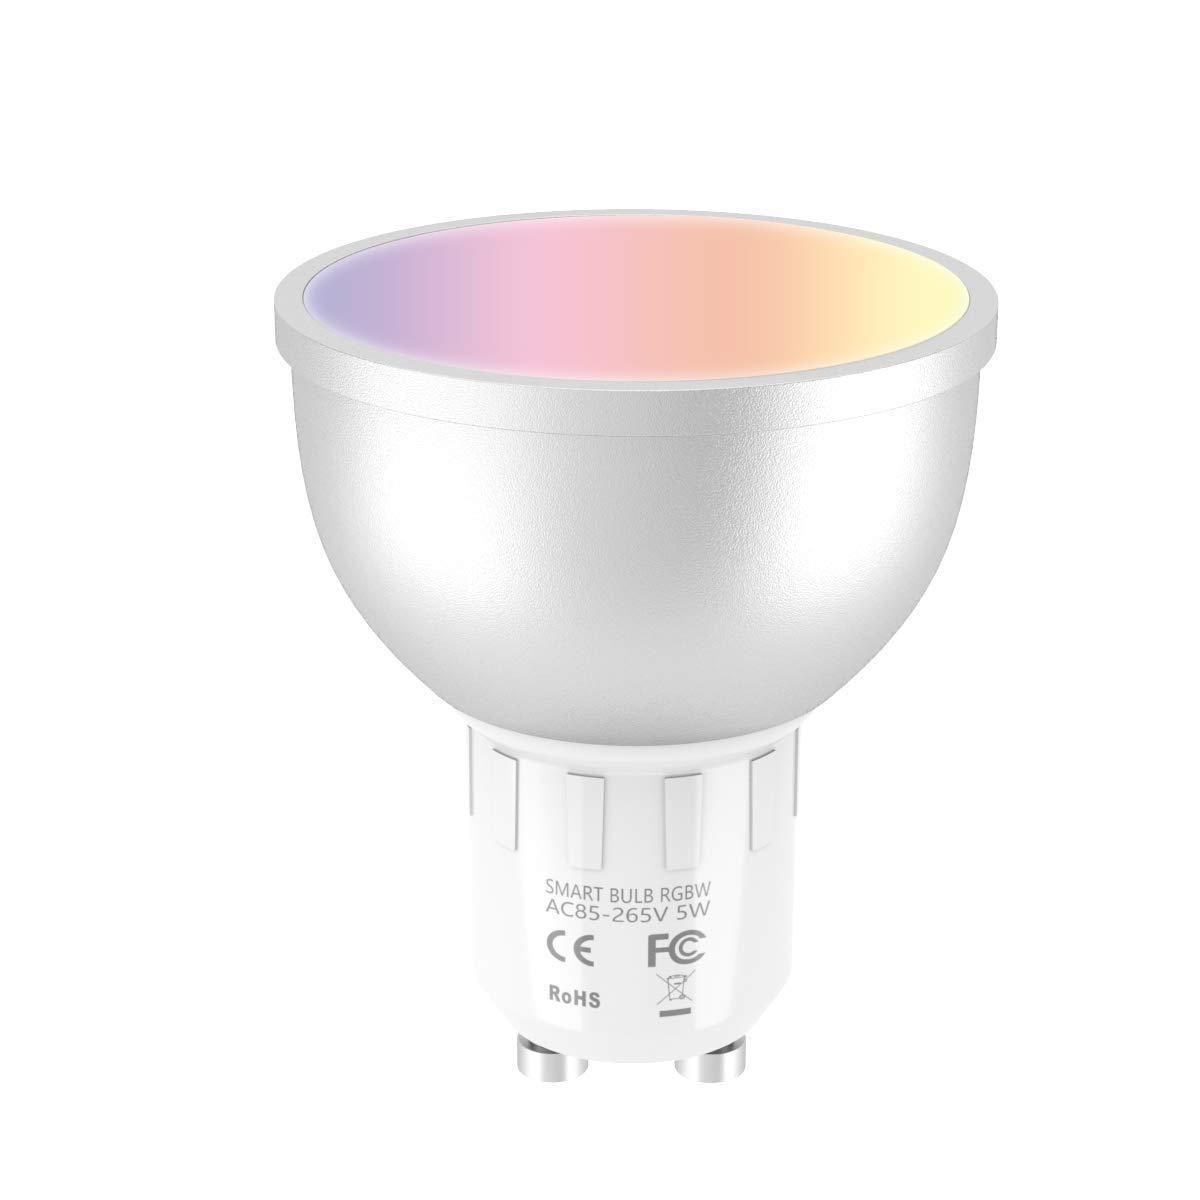 Echo Spot Stand 2018 アップグレード 調節可能 360° 回転台 アルミニウムスタンドマウント メタルブラケット 吊り下げ式エコーアクセサリー Echo Spot ブラックスーパーライトに対応 B07G4BKJBJ